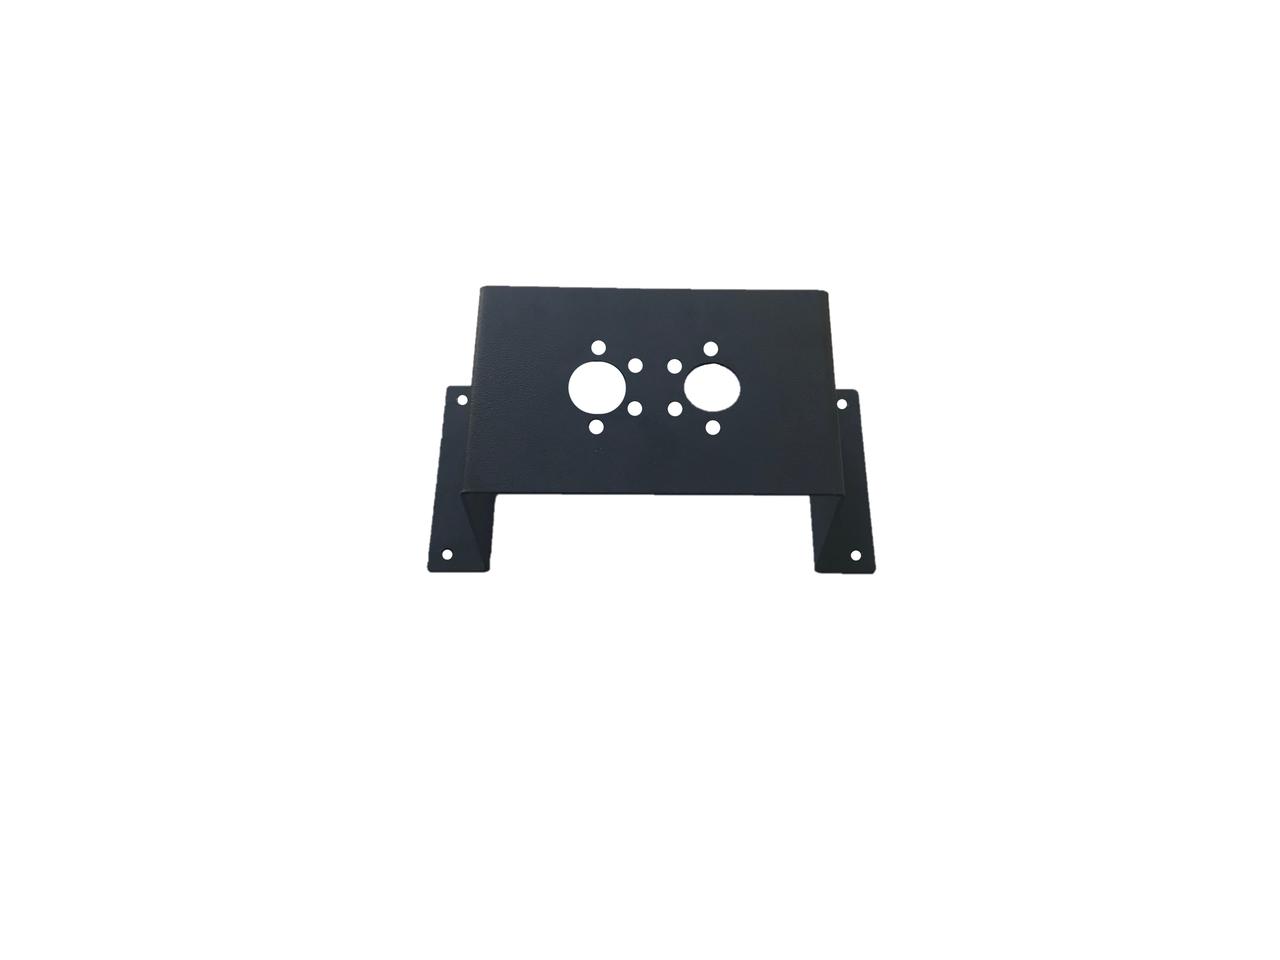 Кронштейн напольный для Планар 2д, 4дм2, 44д - фото 2